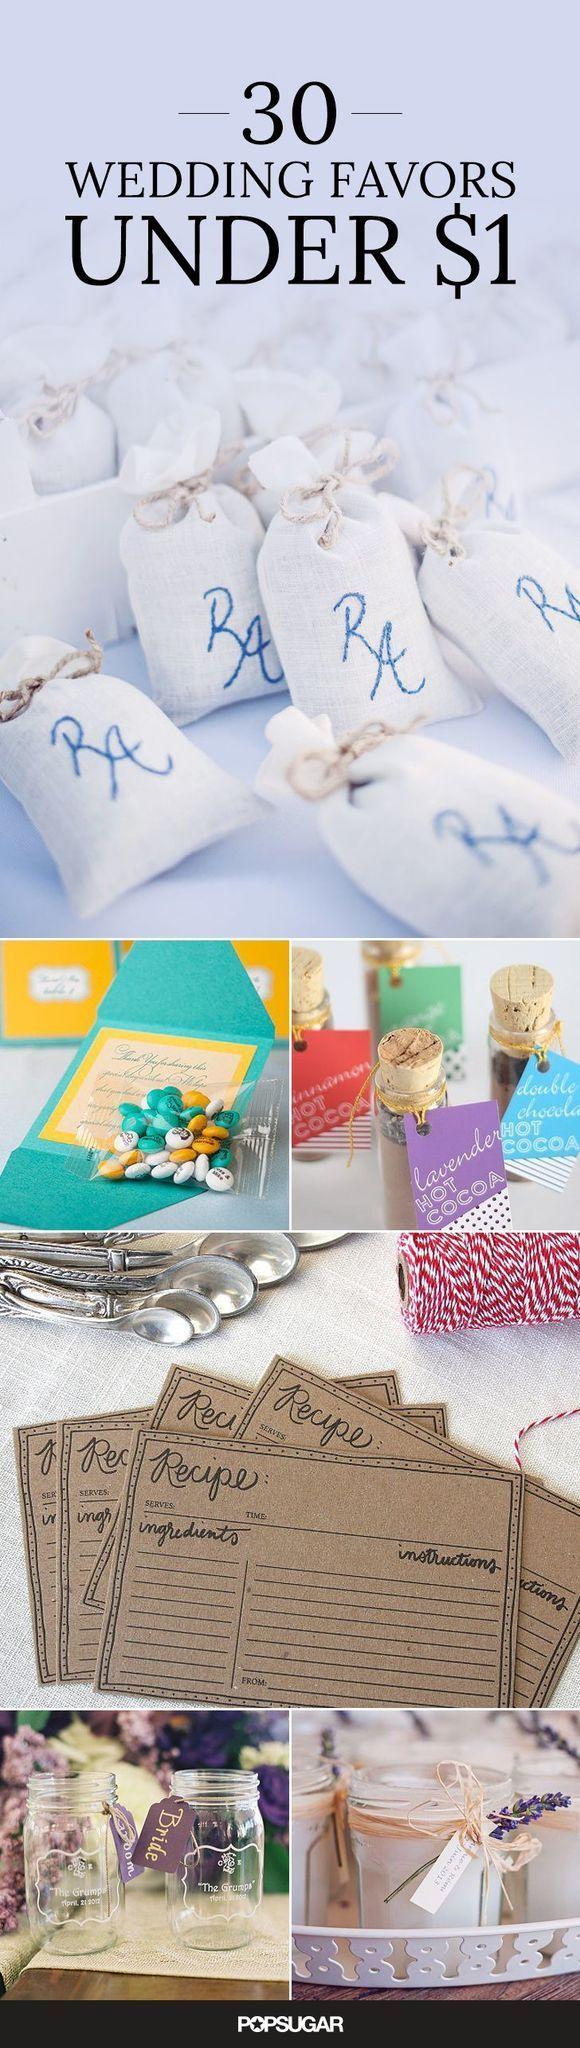 Hello inexpensive wedding favors! #Wedding #Bride #Groom